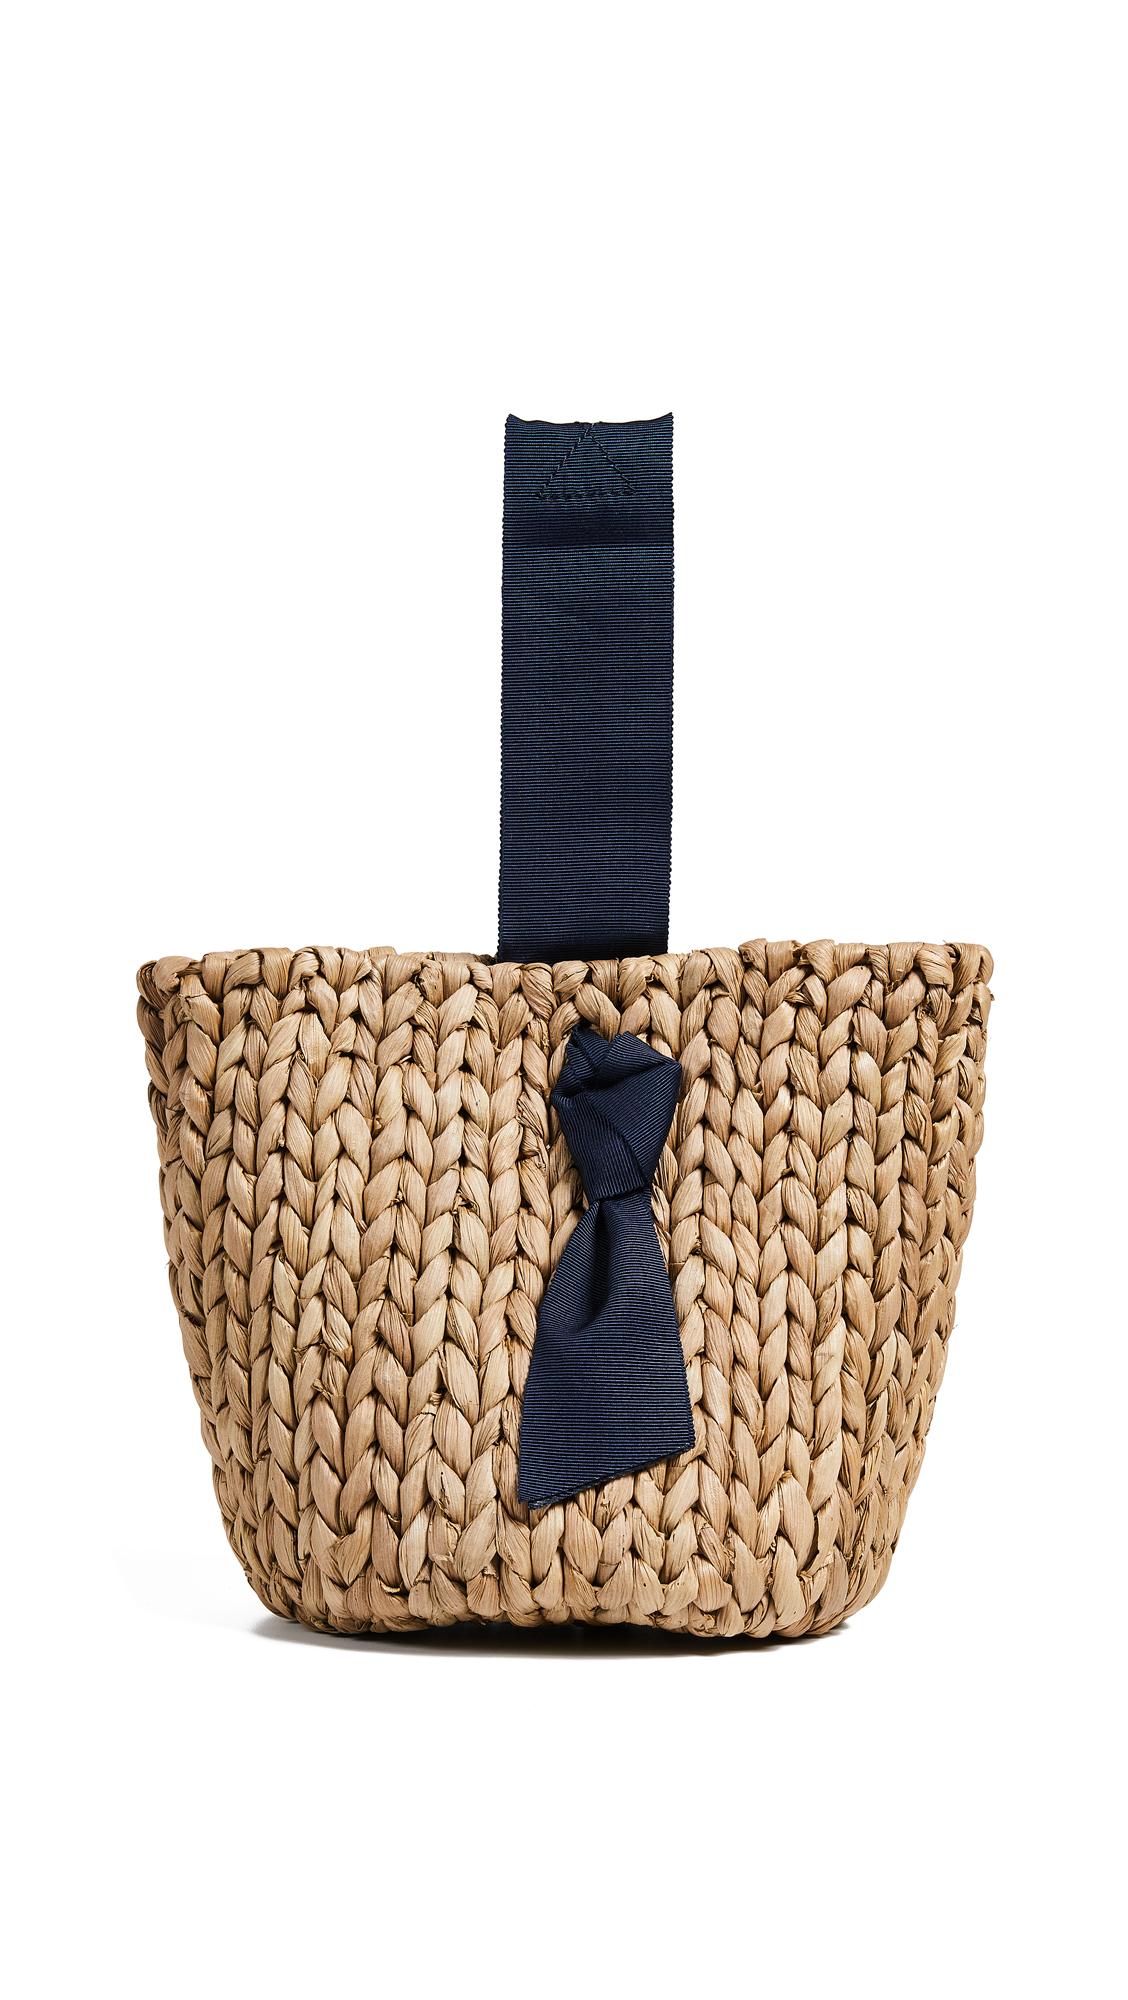 PAMELA MUNSON Isla Bahia Petite Basket Bag in Navy/Natural